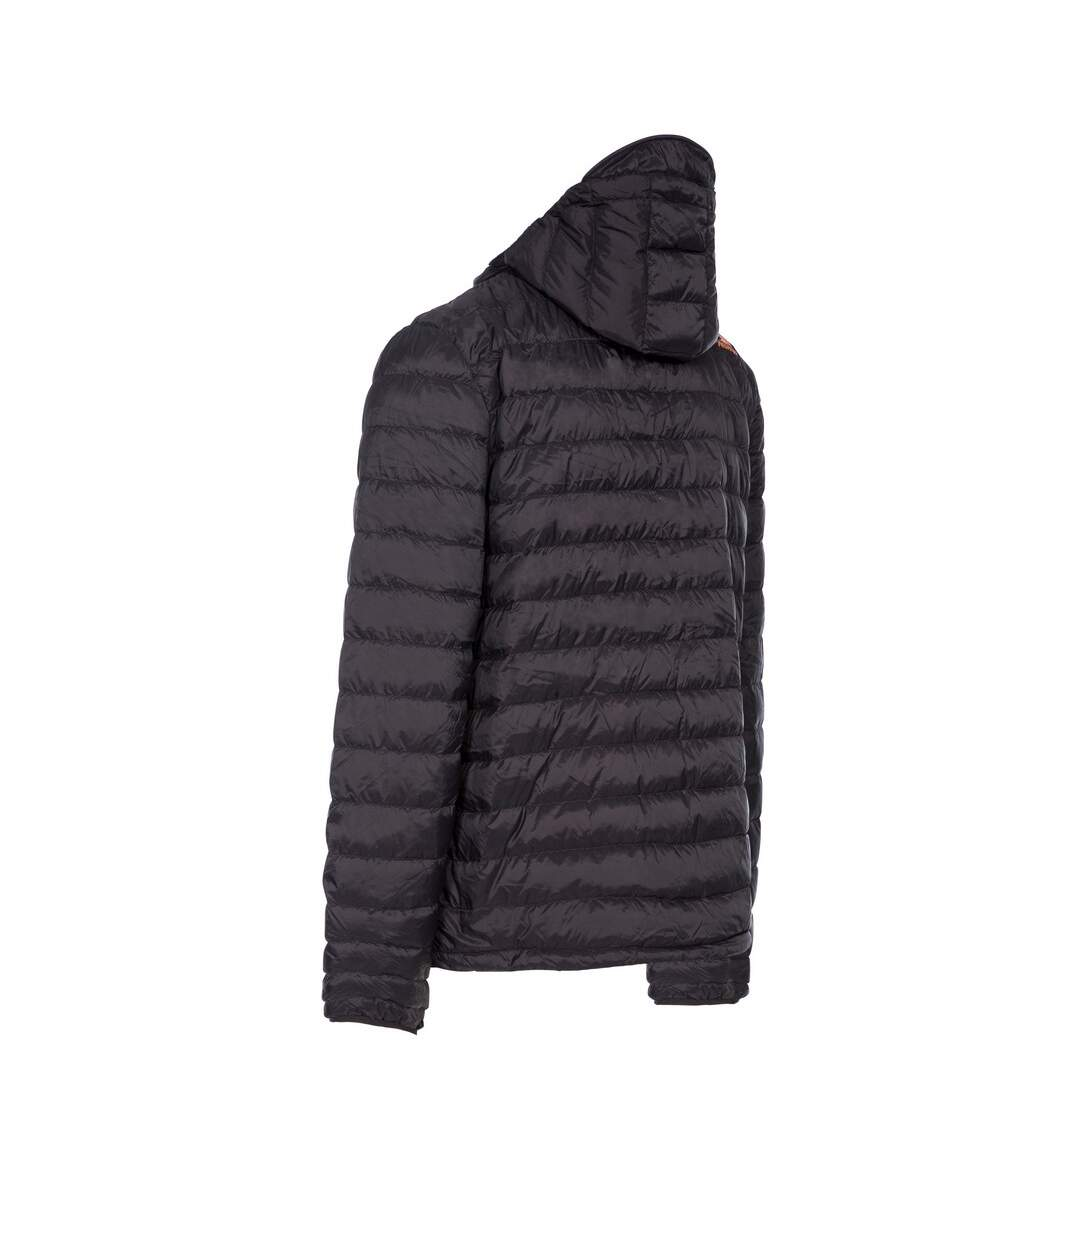 Trespass Mens Digby Down Jacket (Dark Grey) - UTTP3283